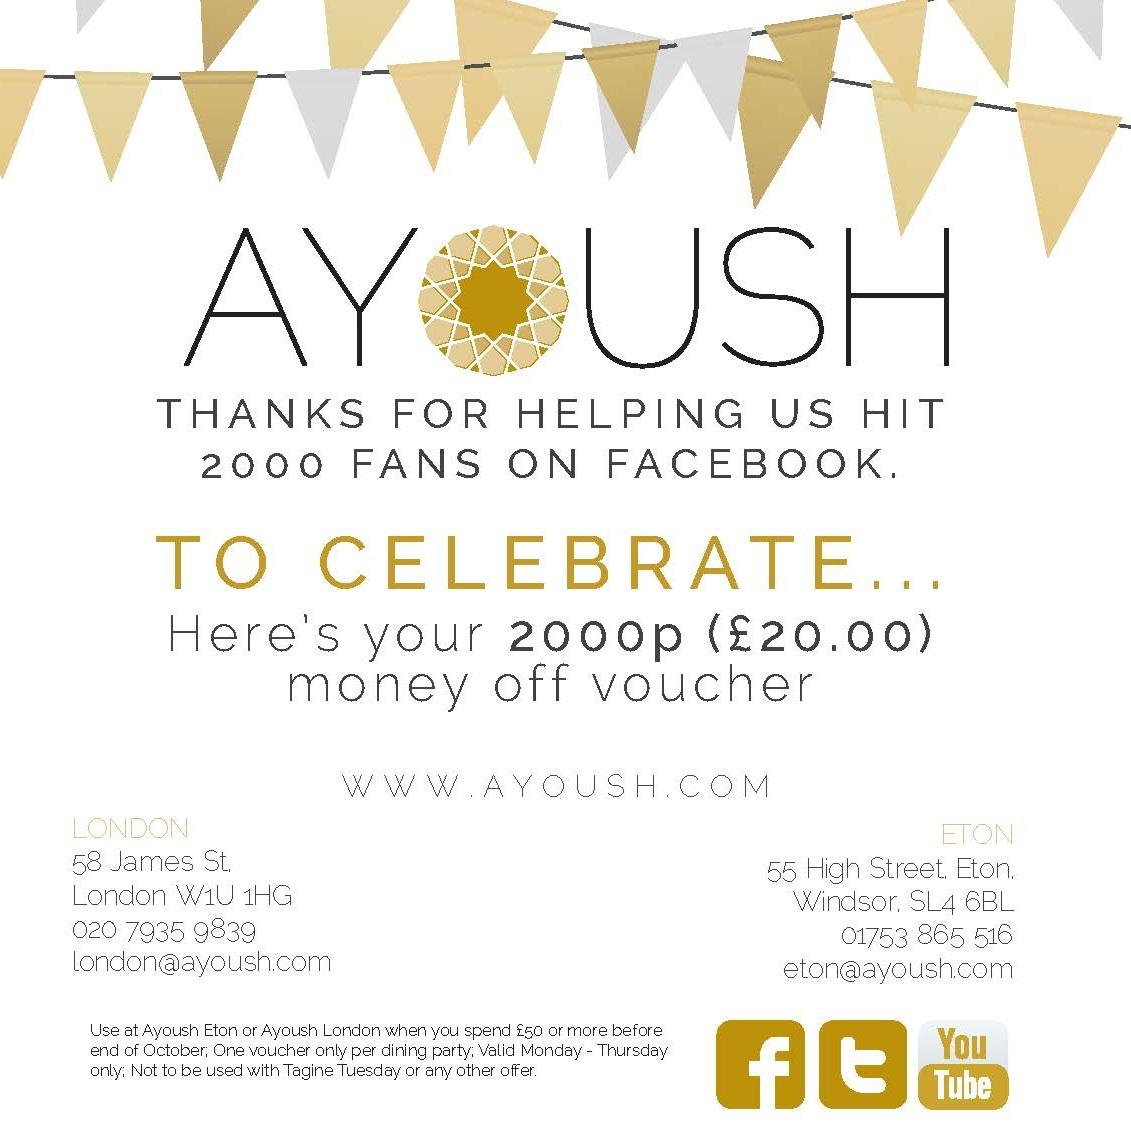 Ayoush £20 voucher